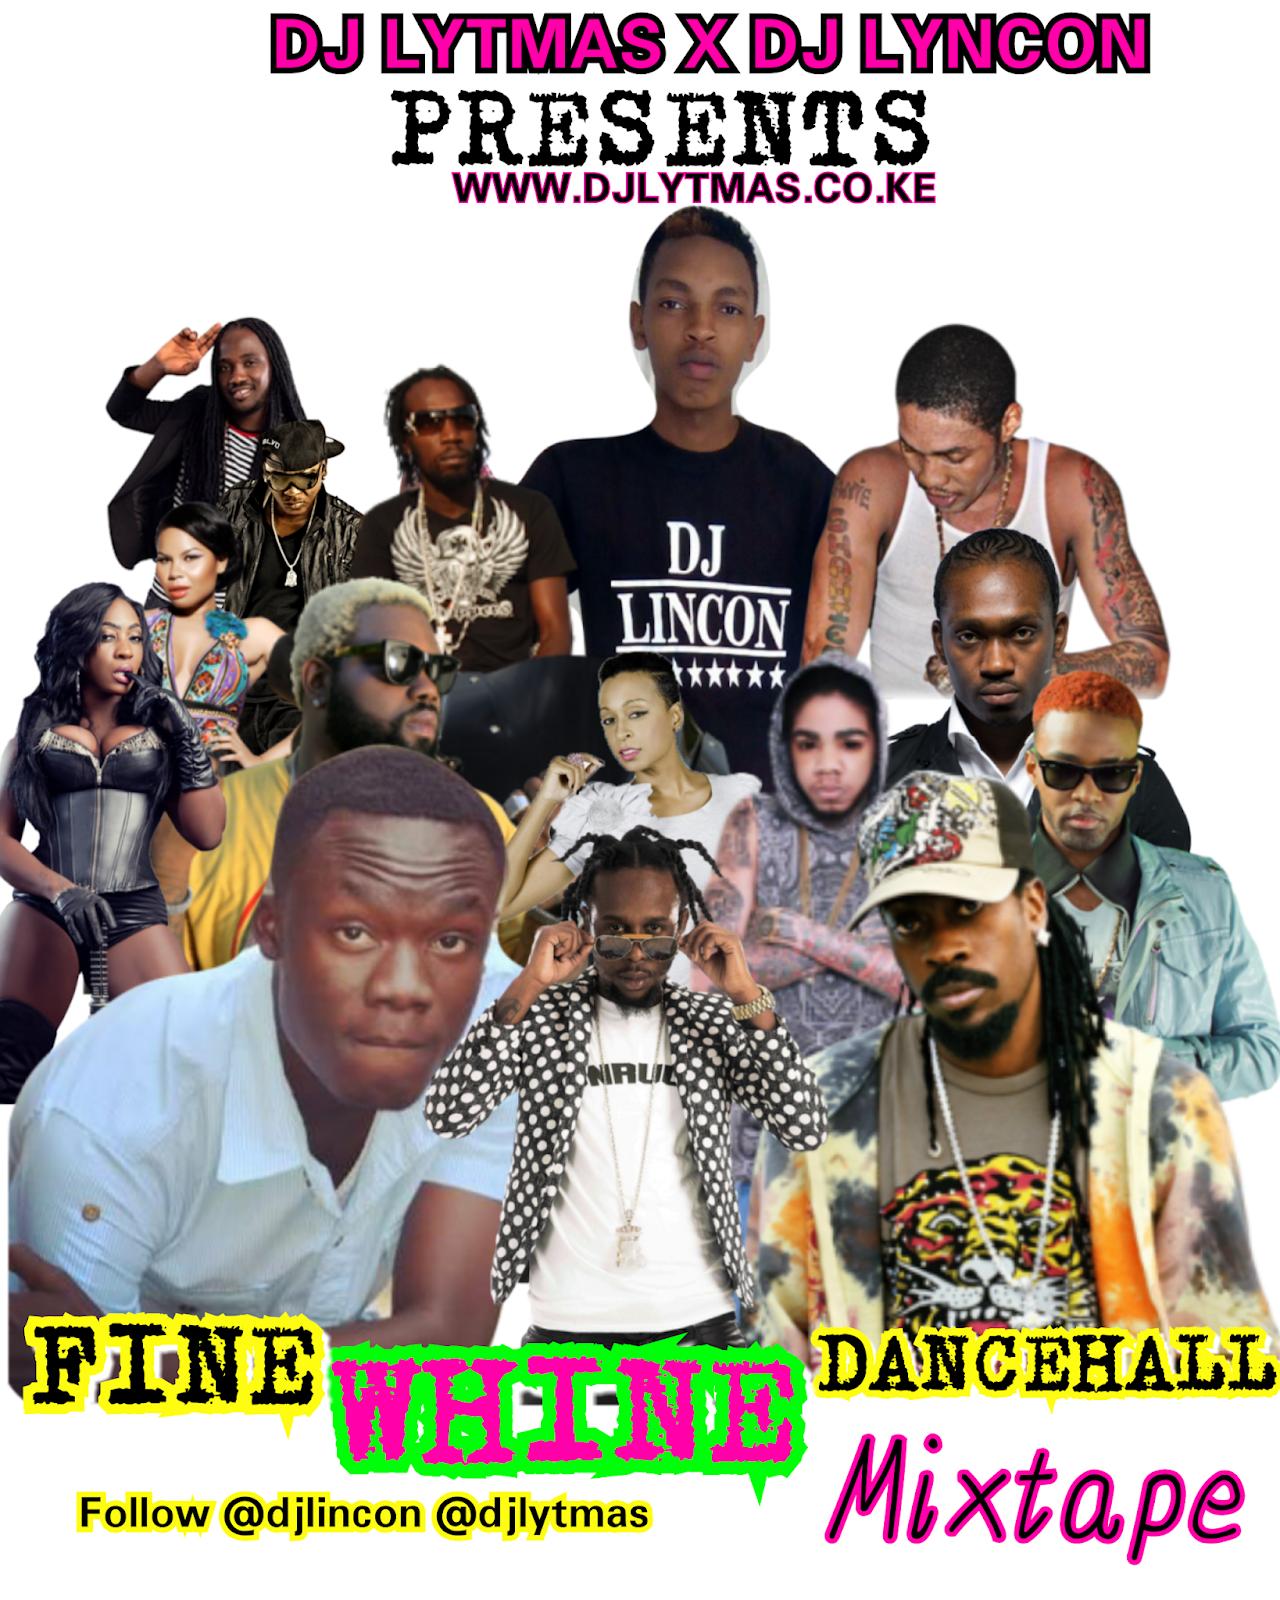 DJ LYTMAS x DJ LINCON - FINE WHINE DANCEHALL MIX - DJ LYTMAS